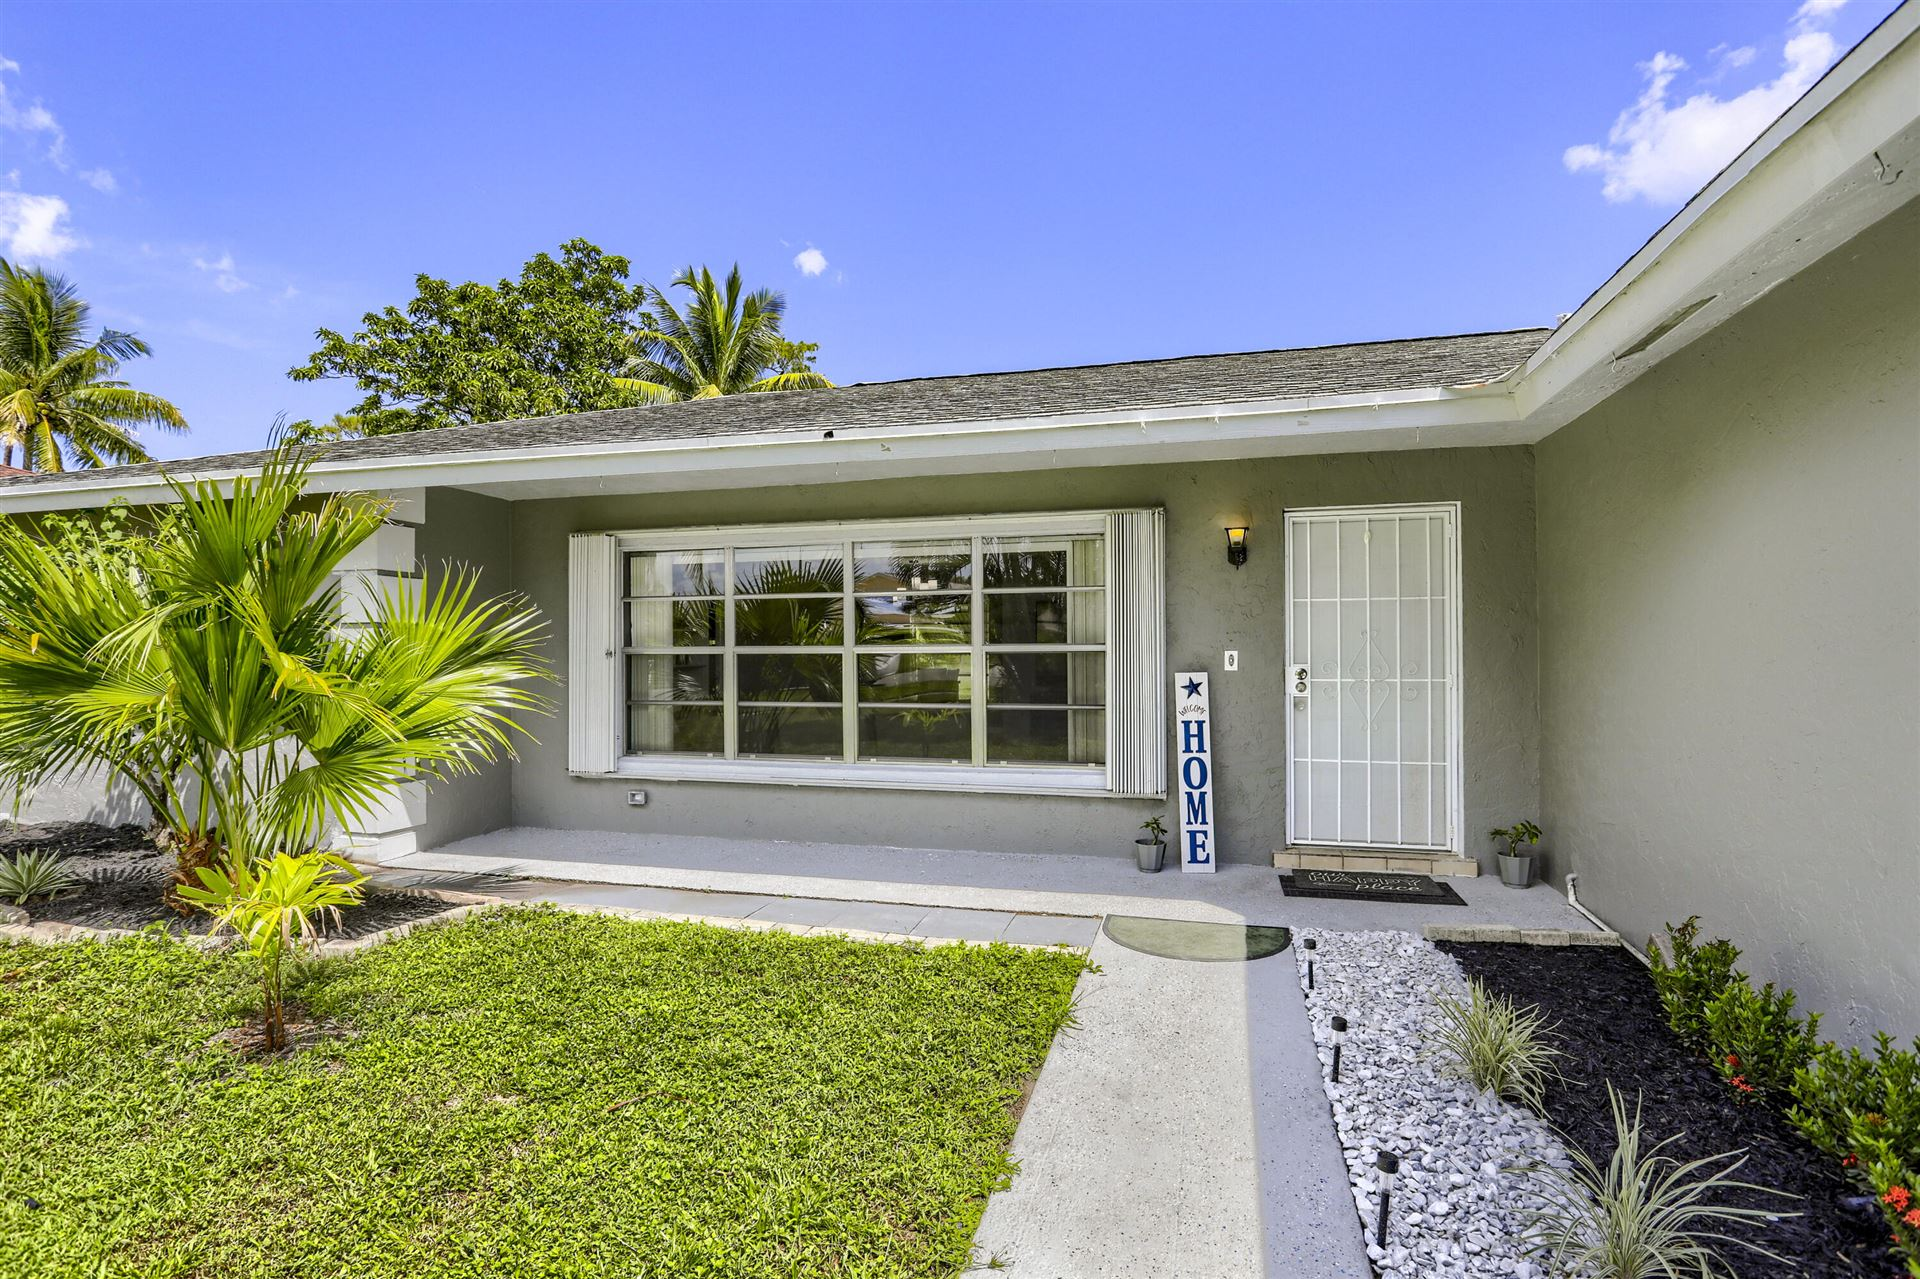 110 Timber Run E, West Palm Beach, FL 33407 - MLS#: RX-10744678